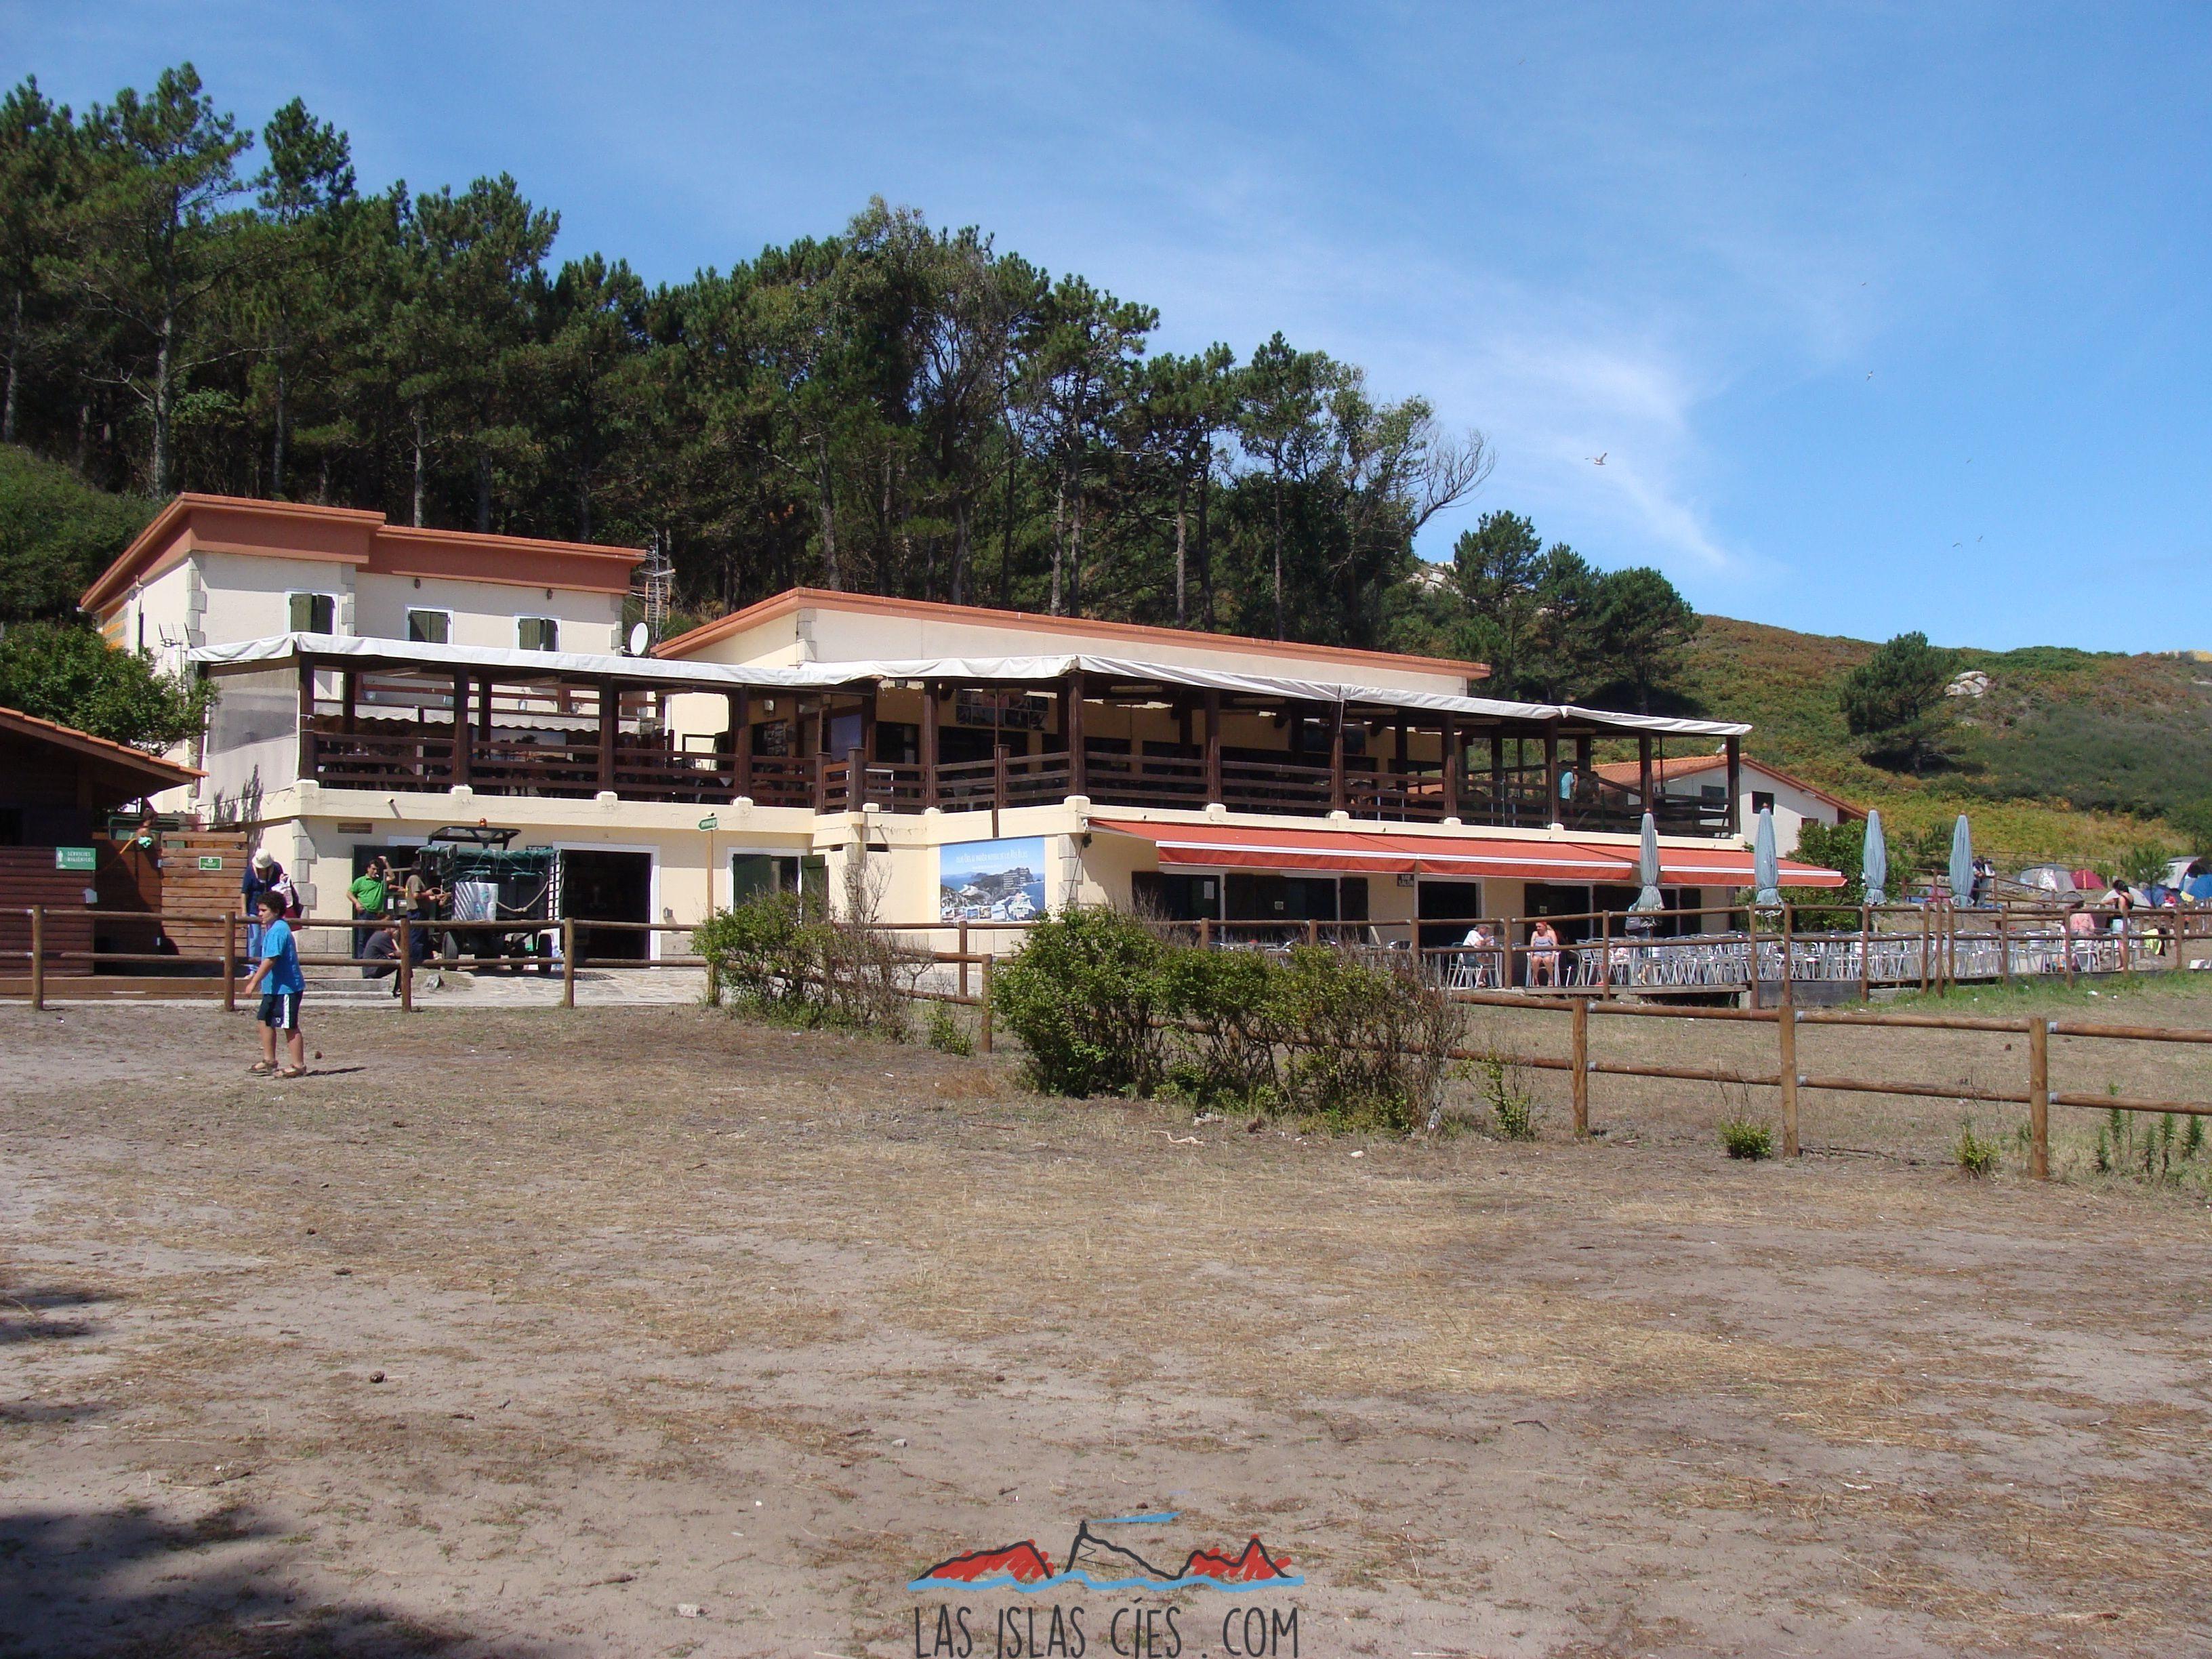 Camping Islas Cíes | Cíes Islands Camping